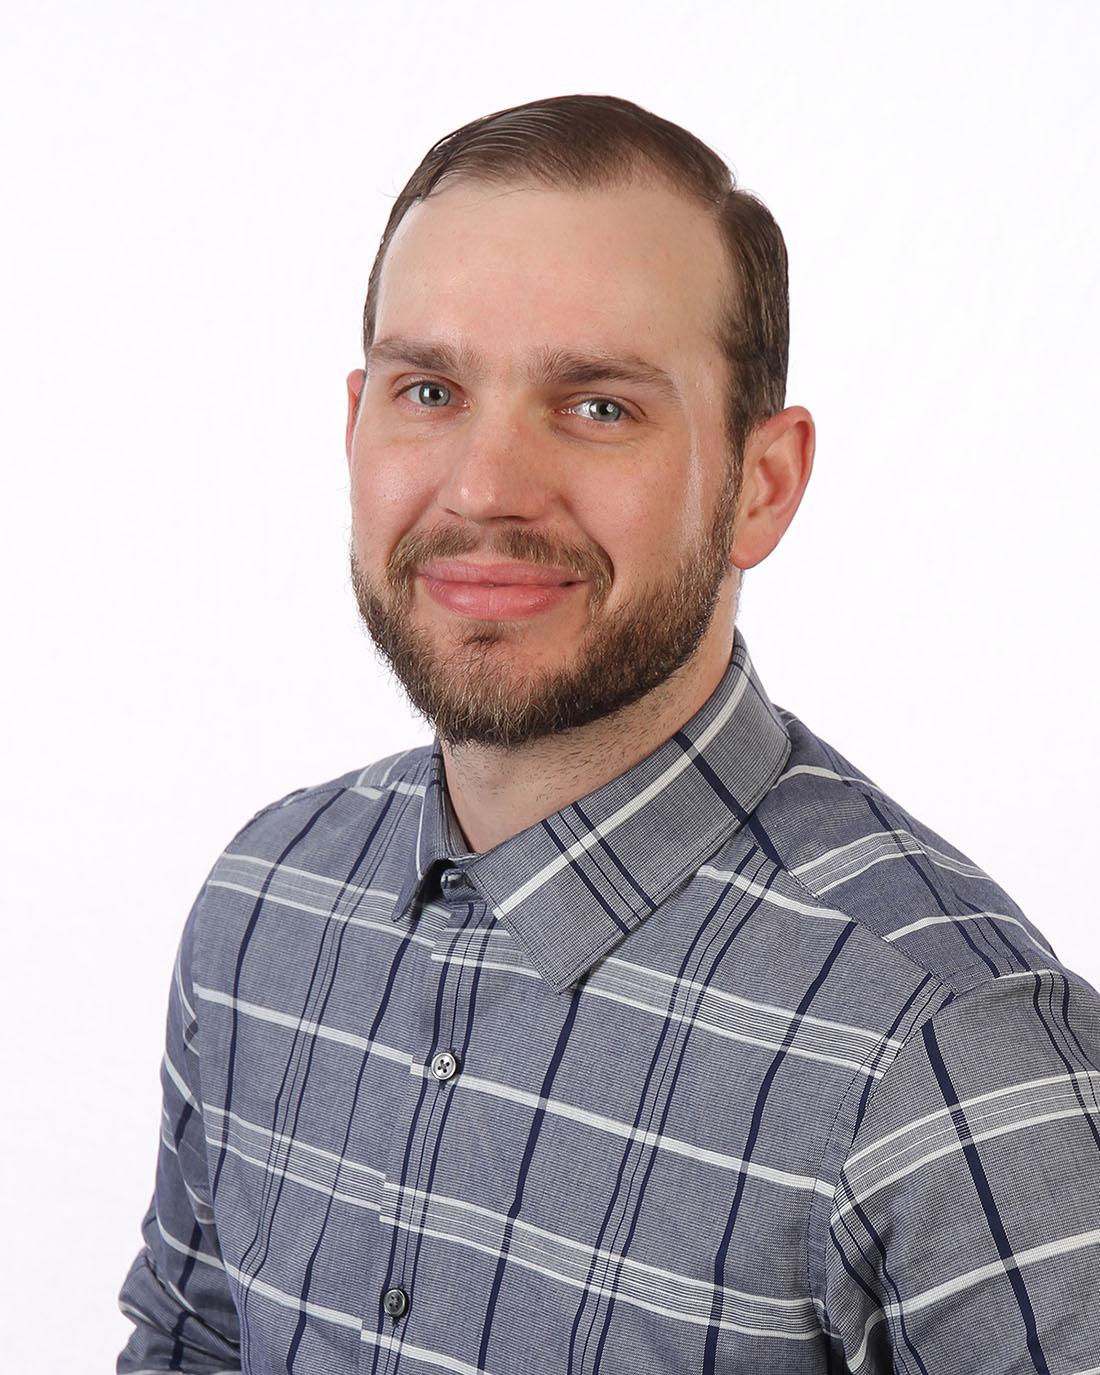 Jordon Schaver